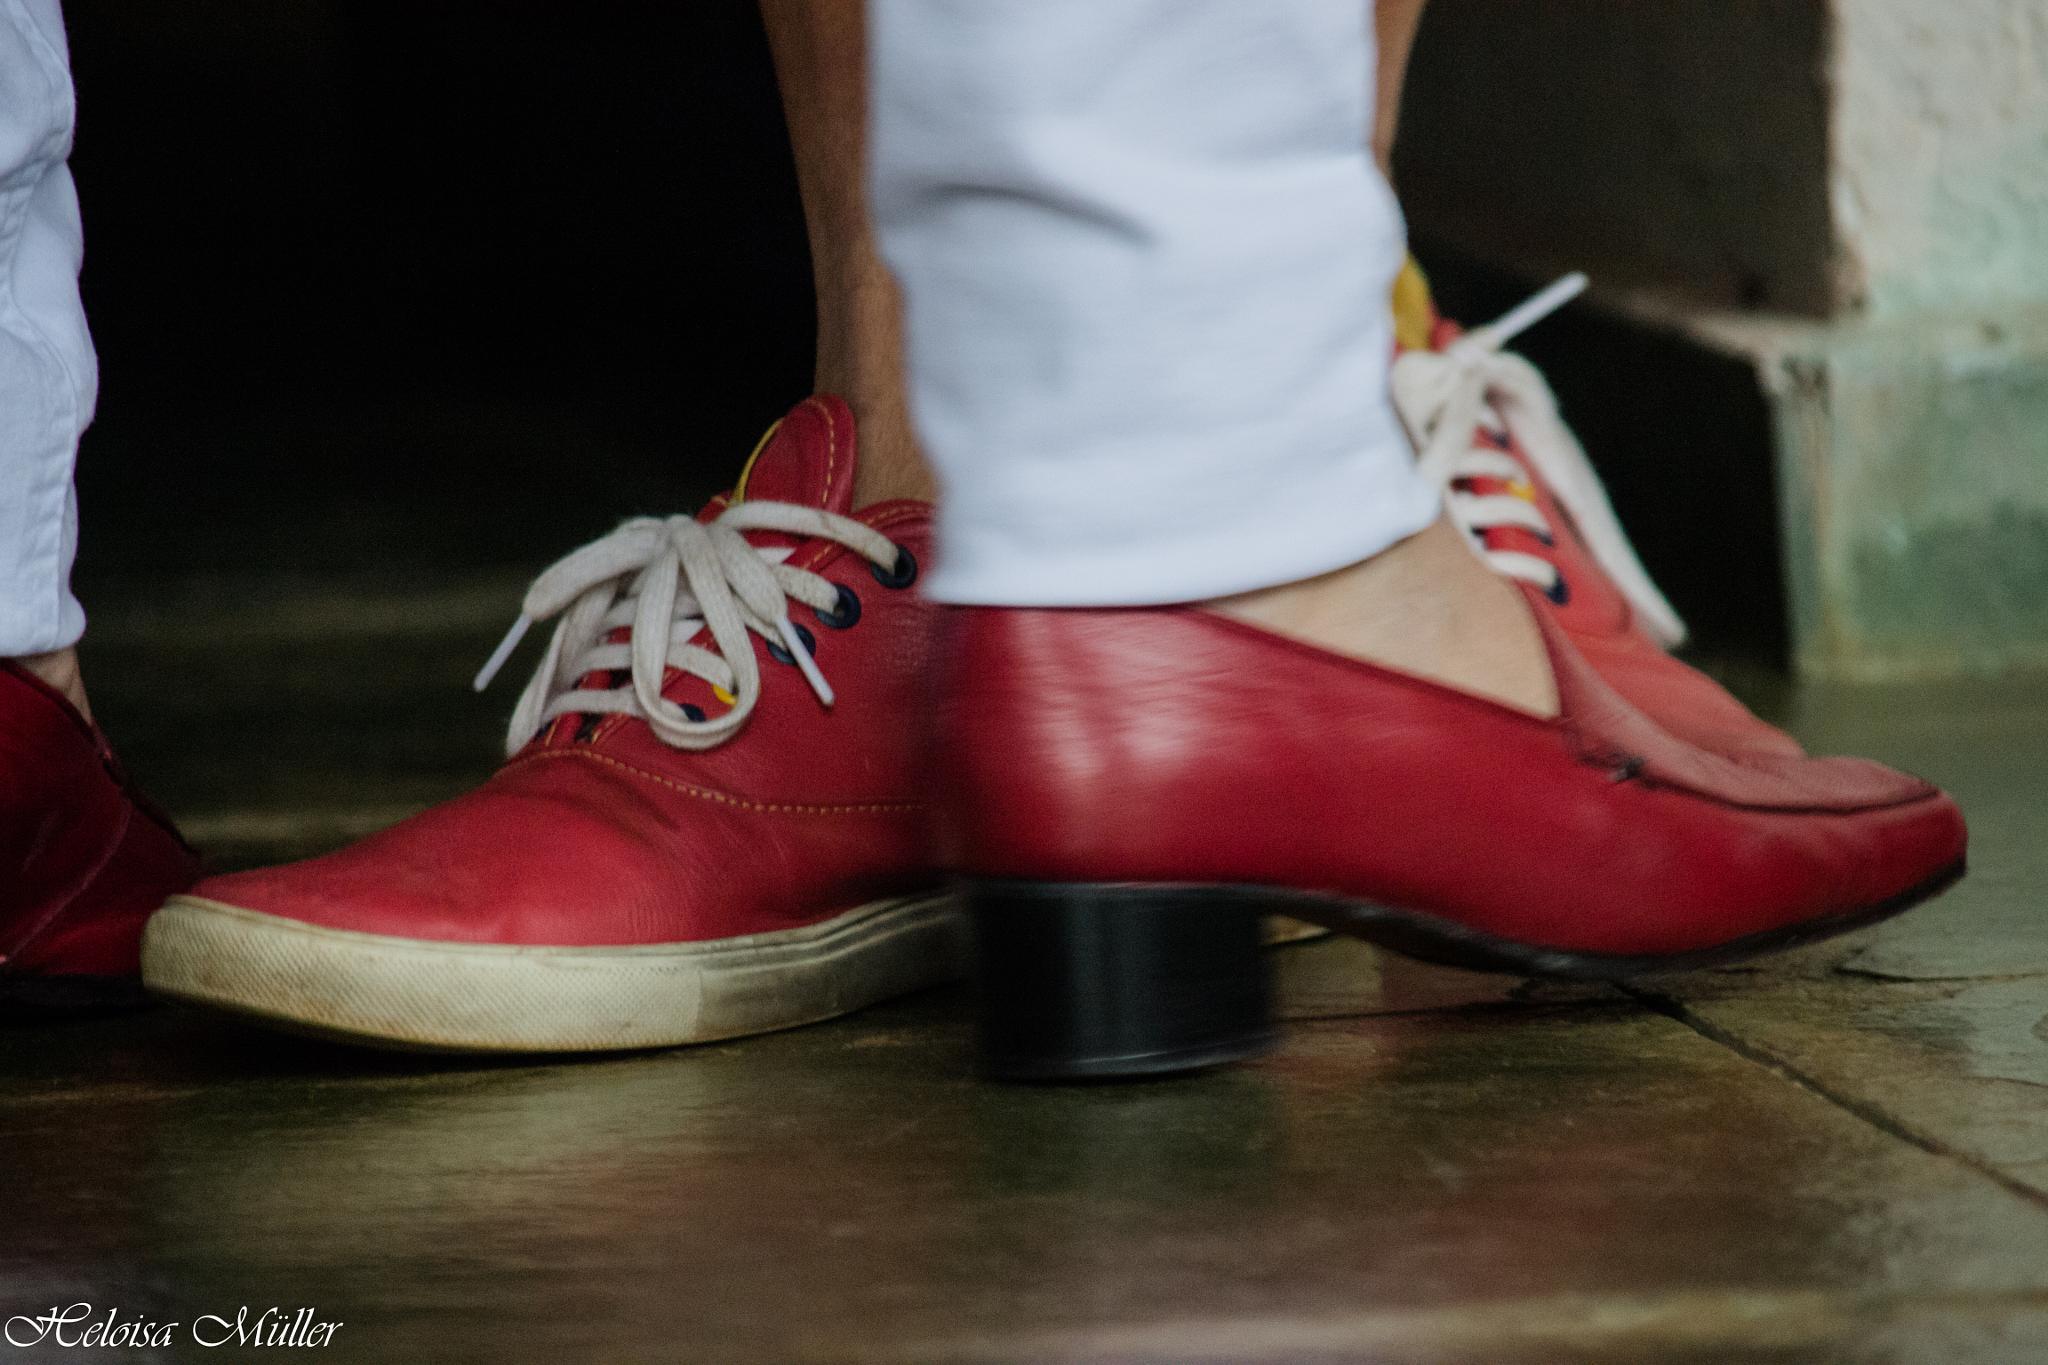 Dance by heloisa.muller.5